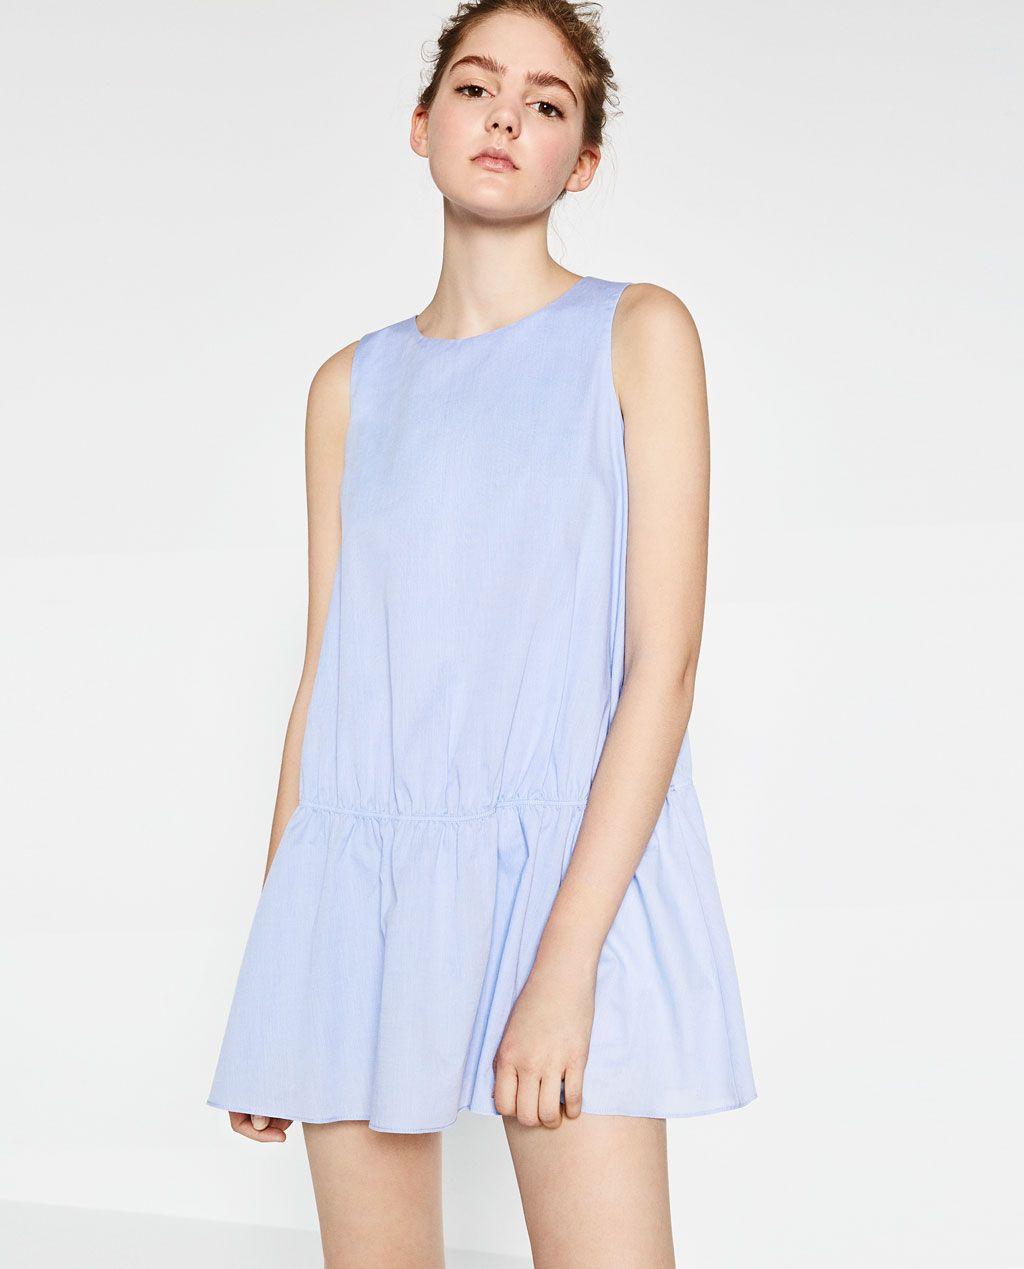 28825f57 Image 3 of FRILLED JUMPSUIT DRESS from Zara | My Style | Zara ...